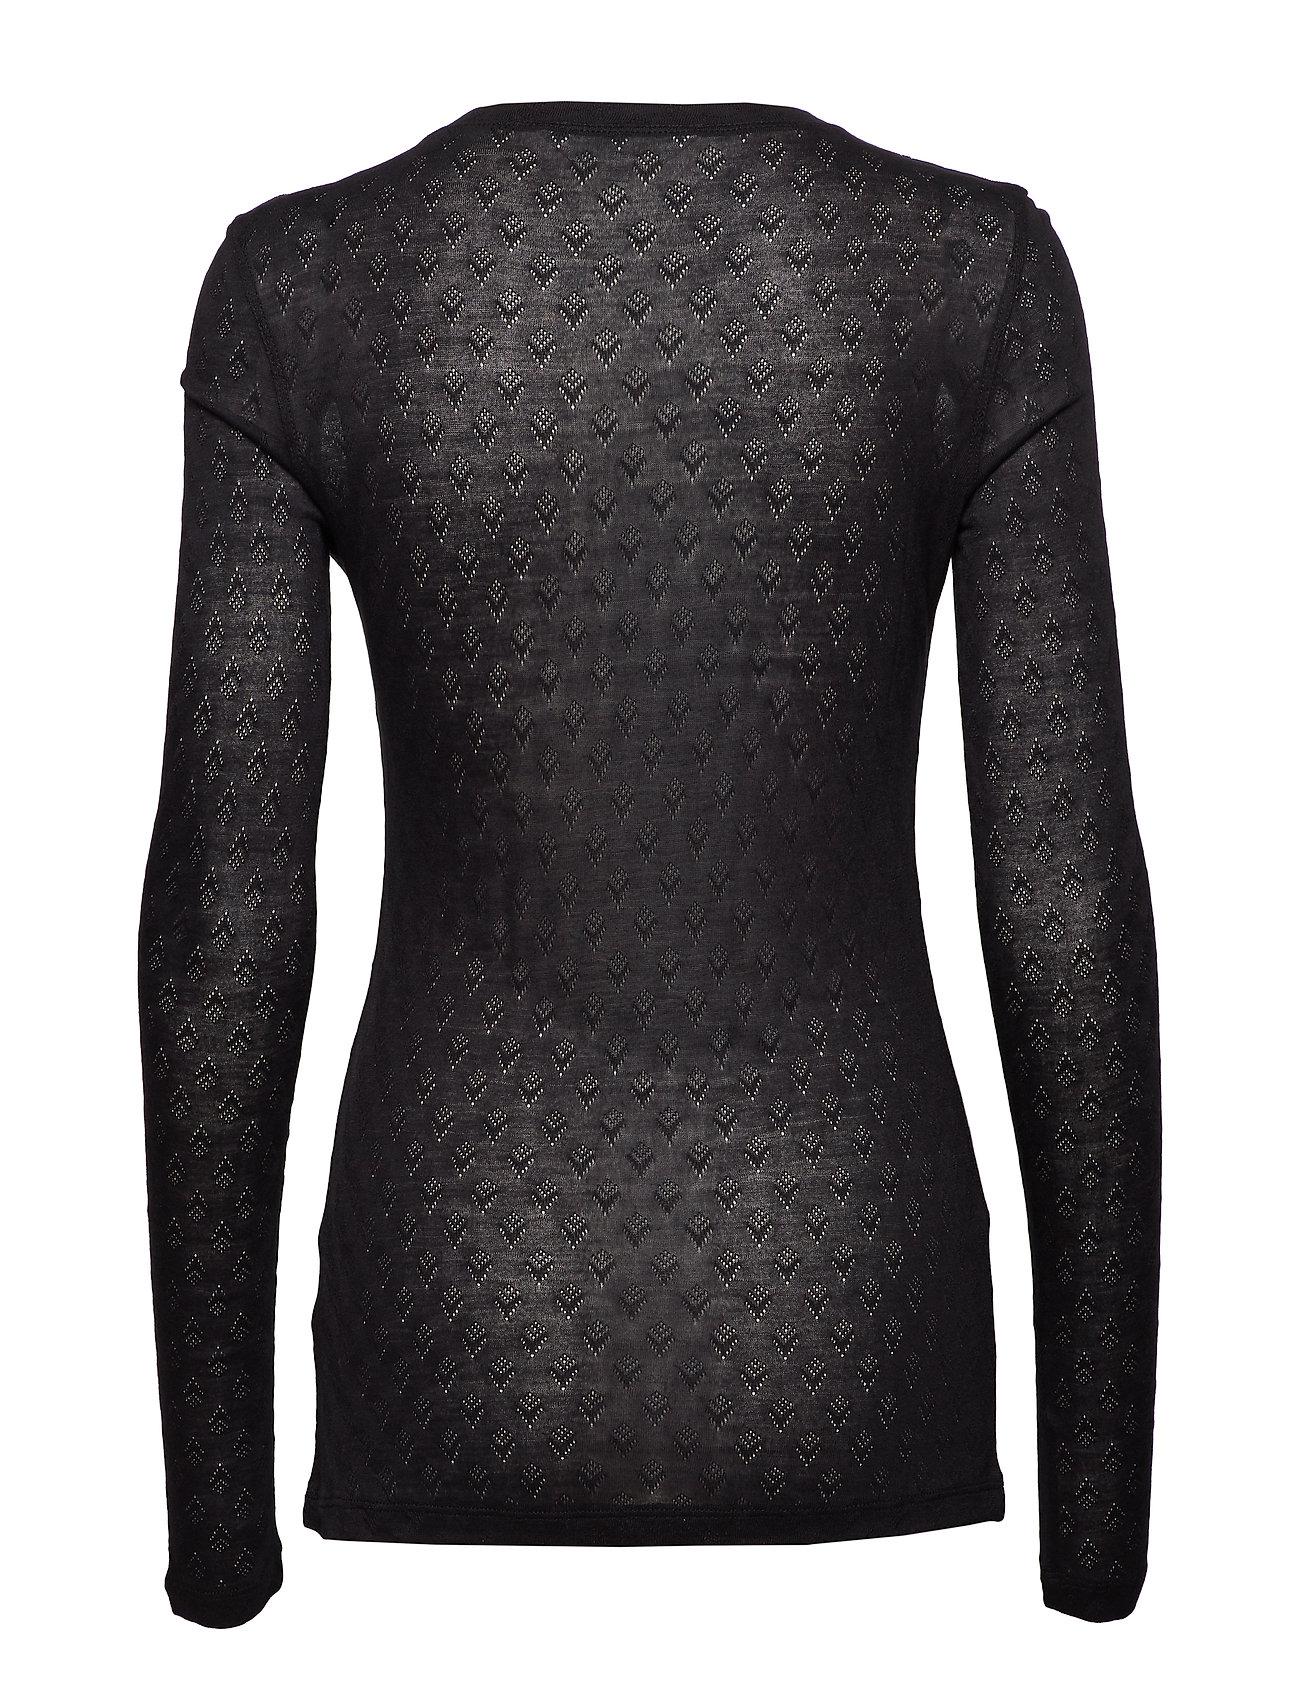 Fermi Langærmet T shirt Sort Gai+Lisva